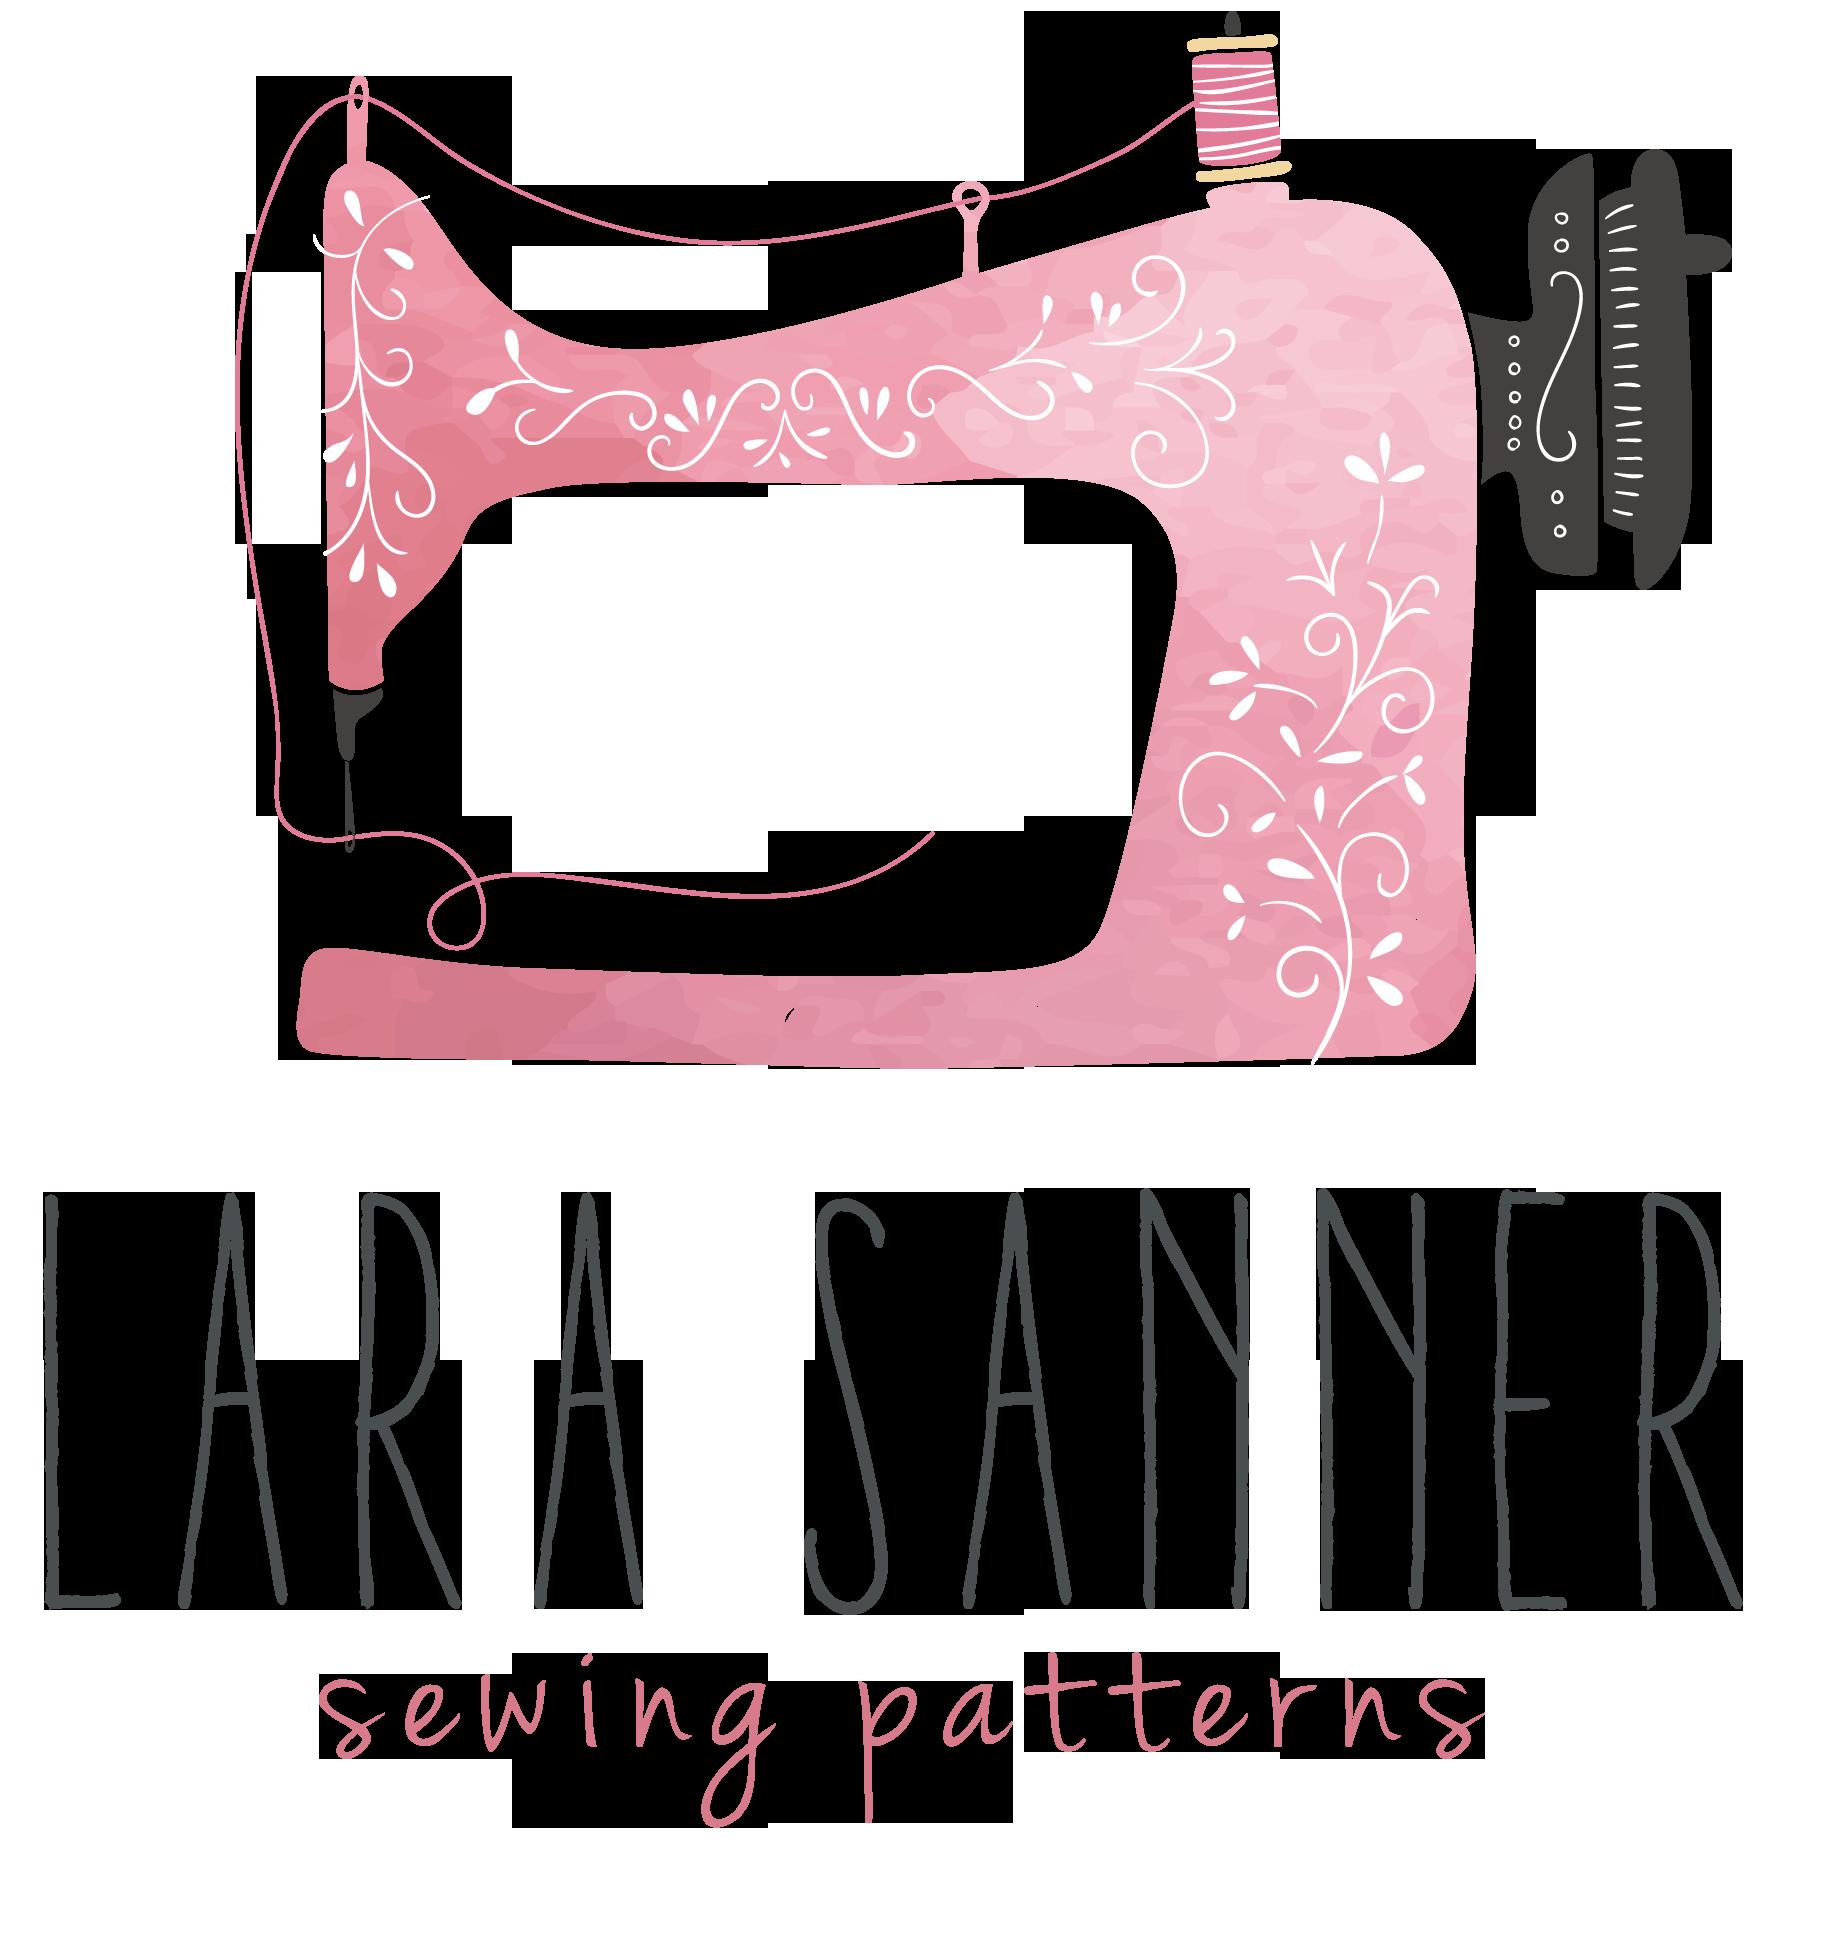 Lara Sanner